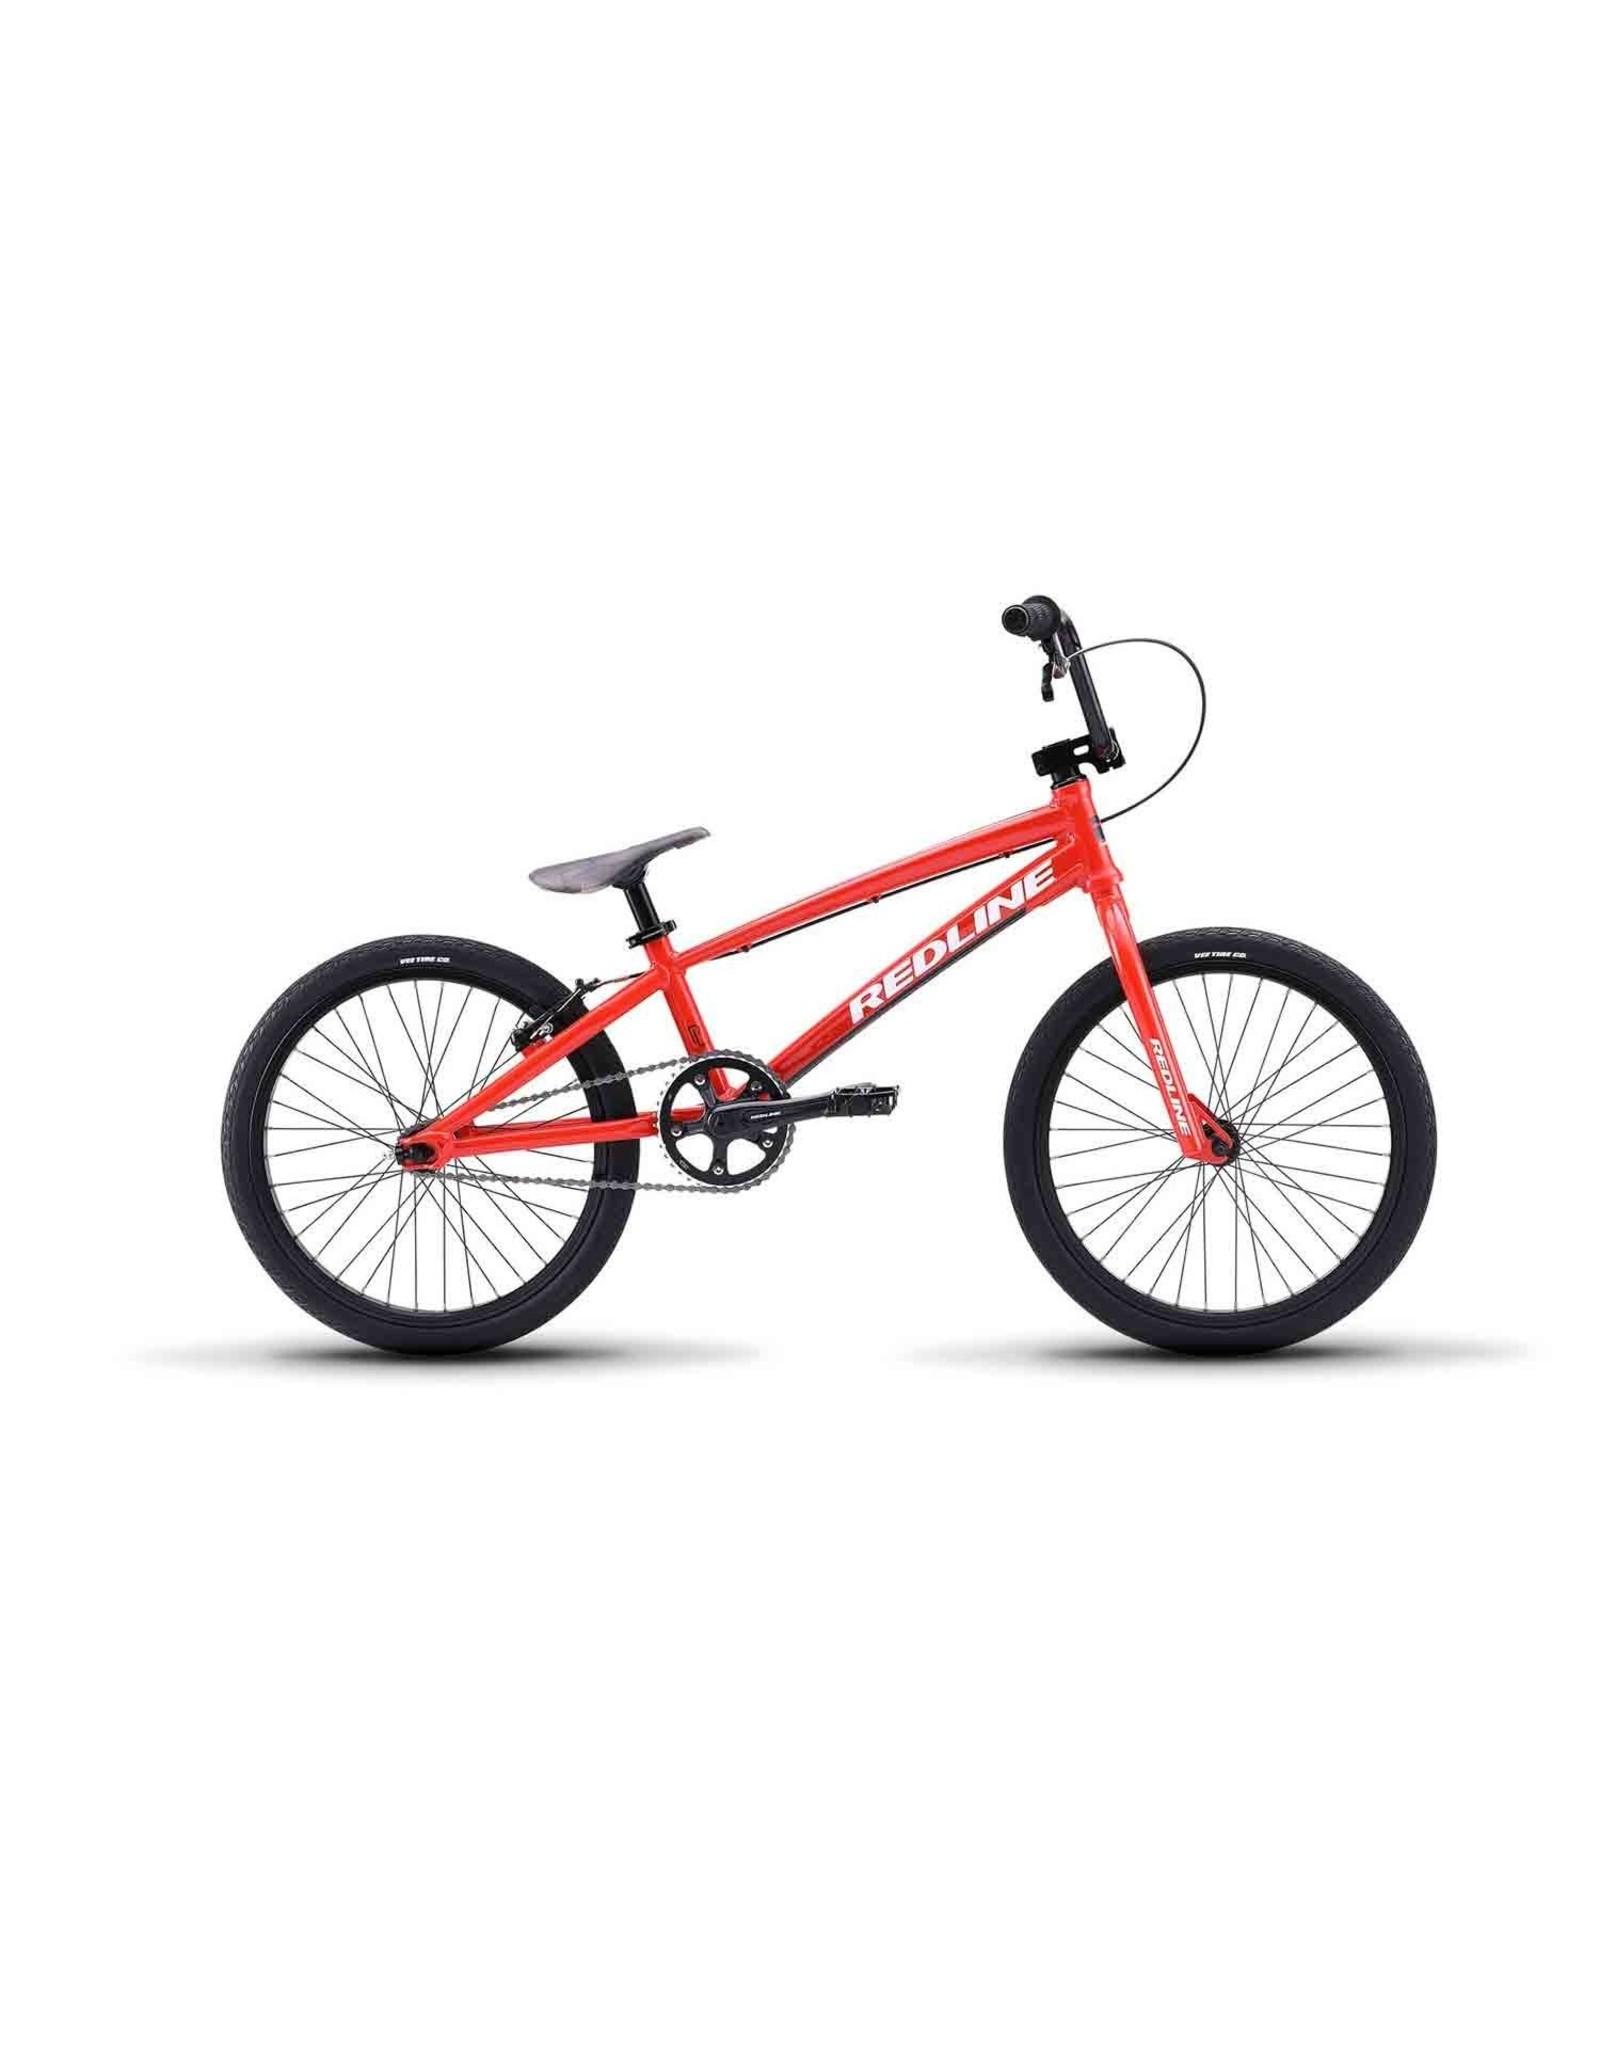 Redline 2019 Proline Expert XL B20 RED